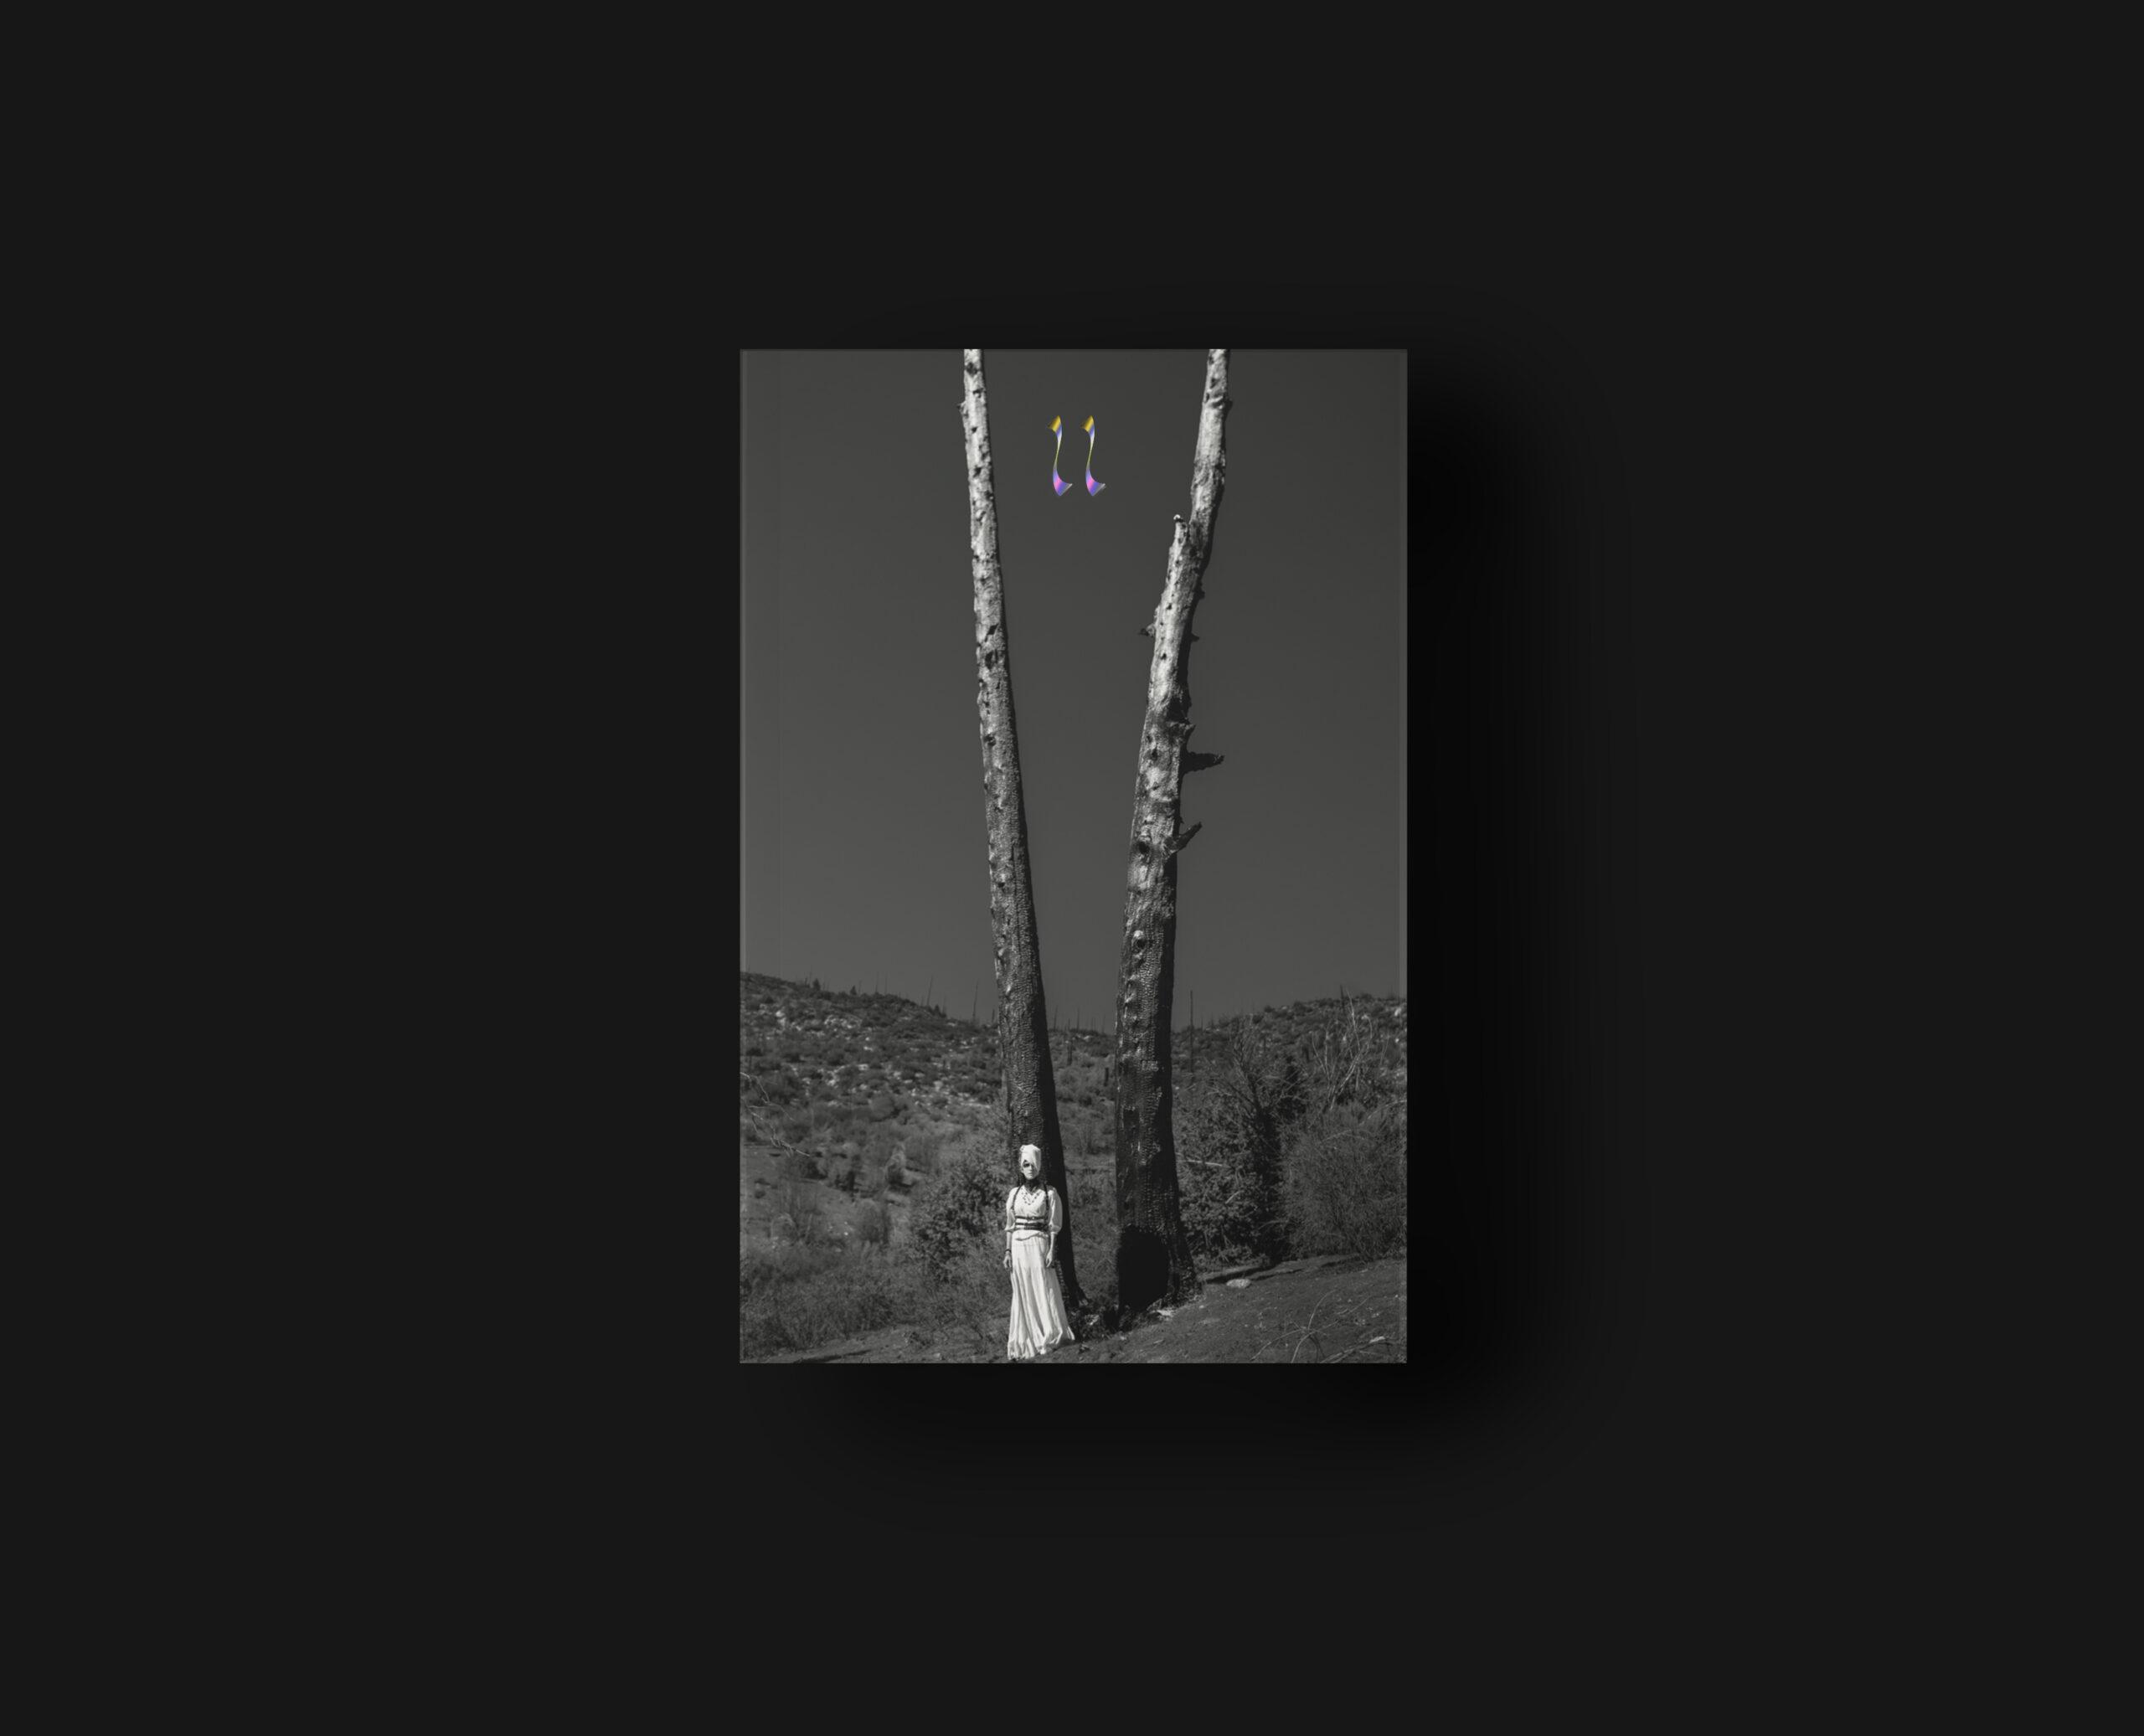 Lullcards_II